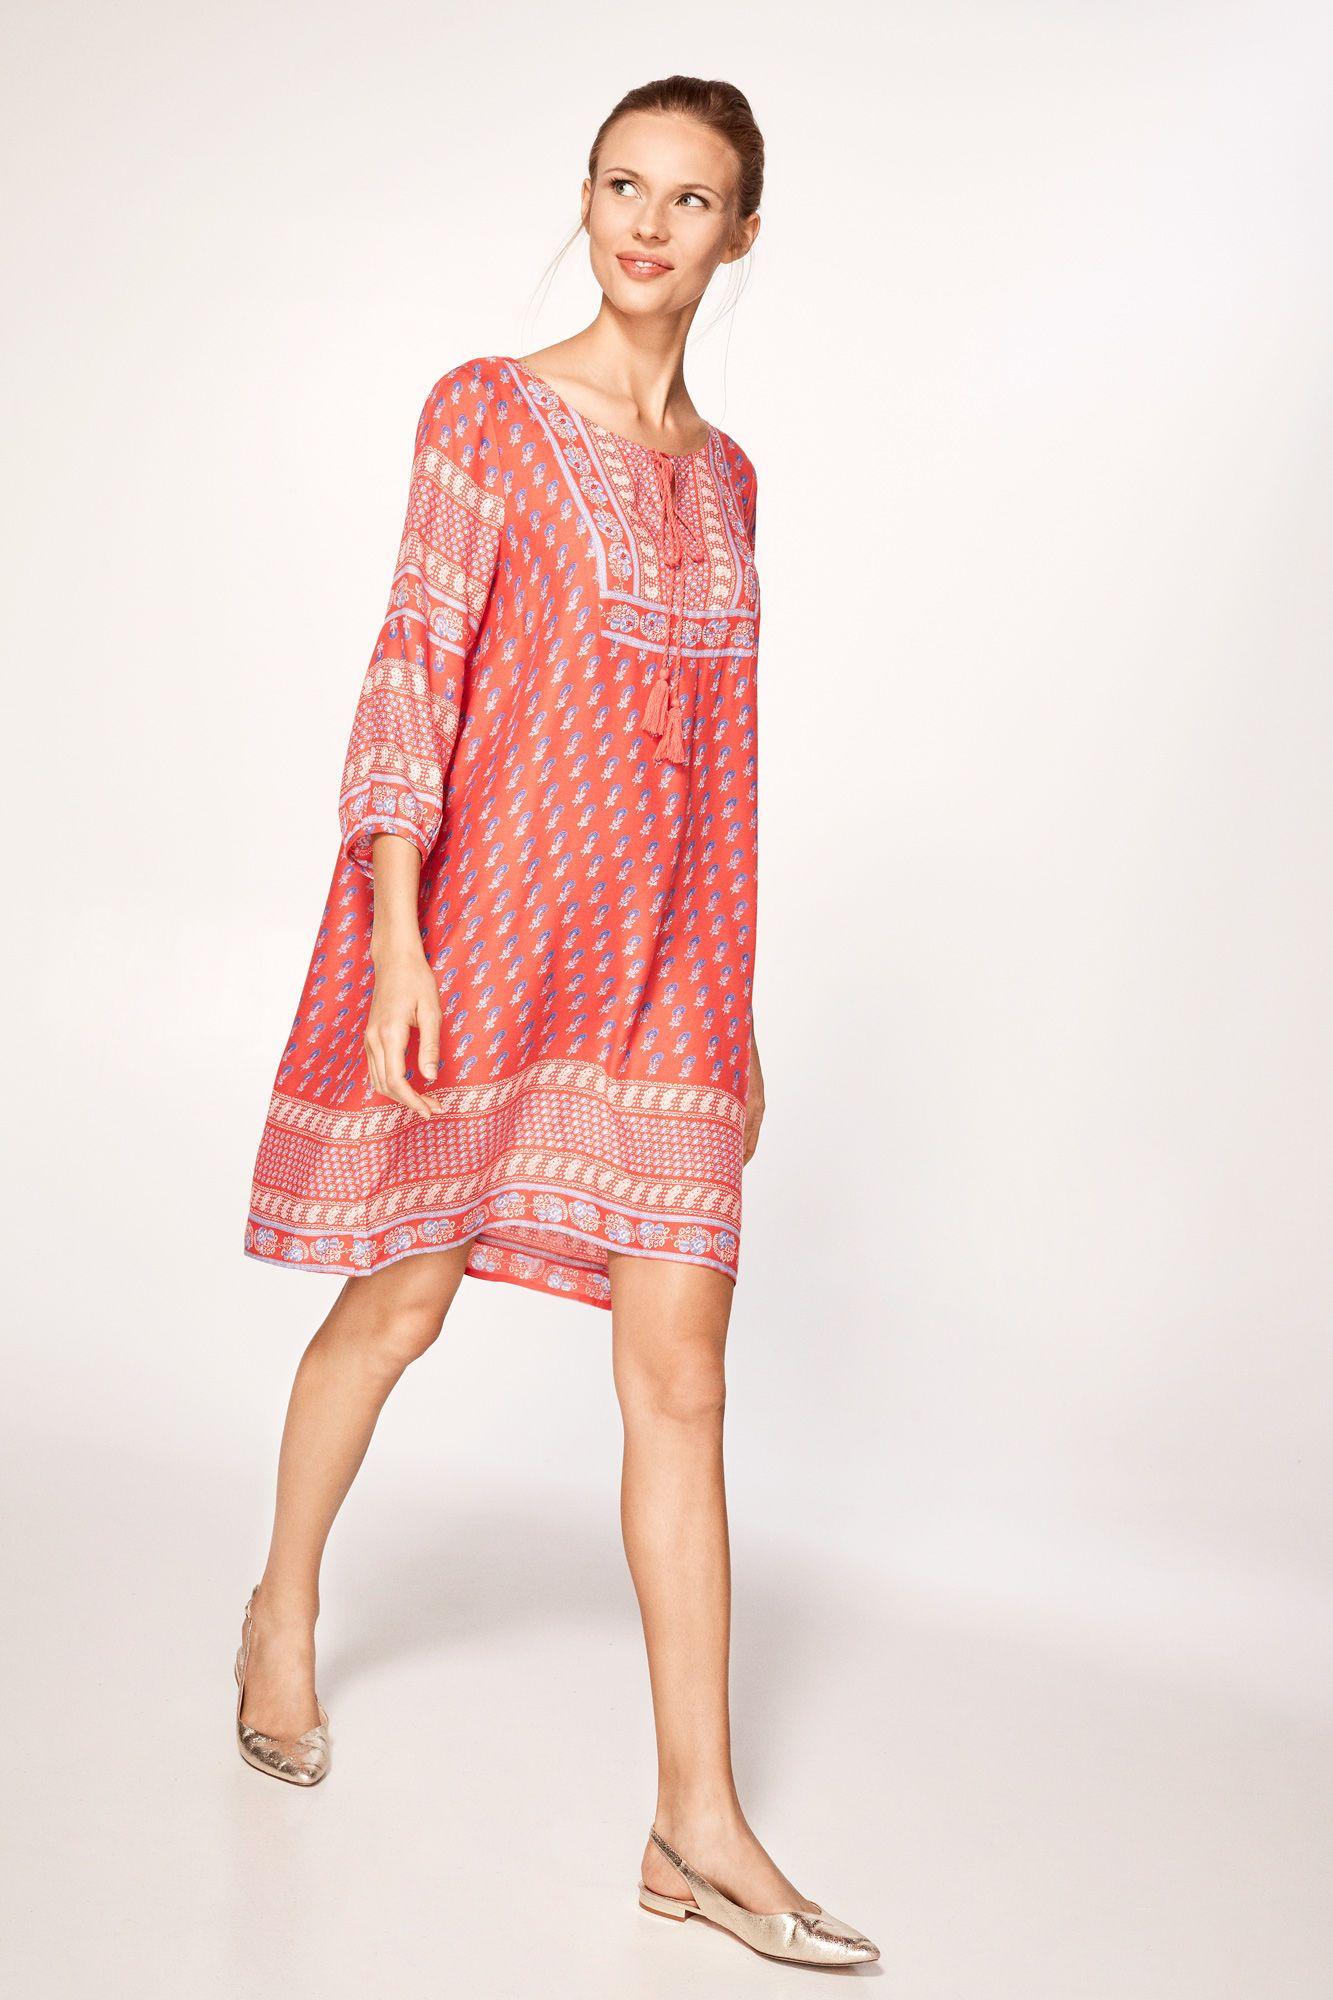 Bonito Ottawa Vestido De Fiesta Modelo - Colección de Vestidos de ...